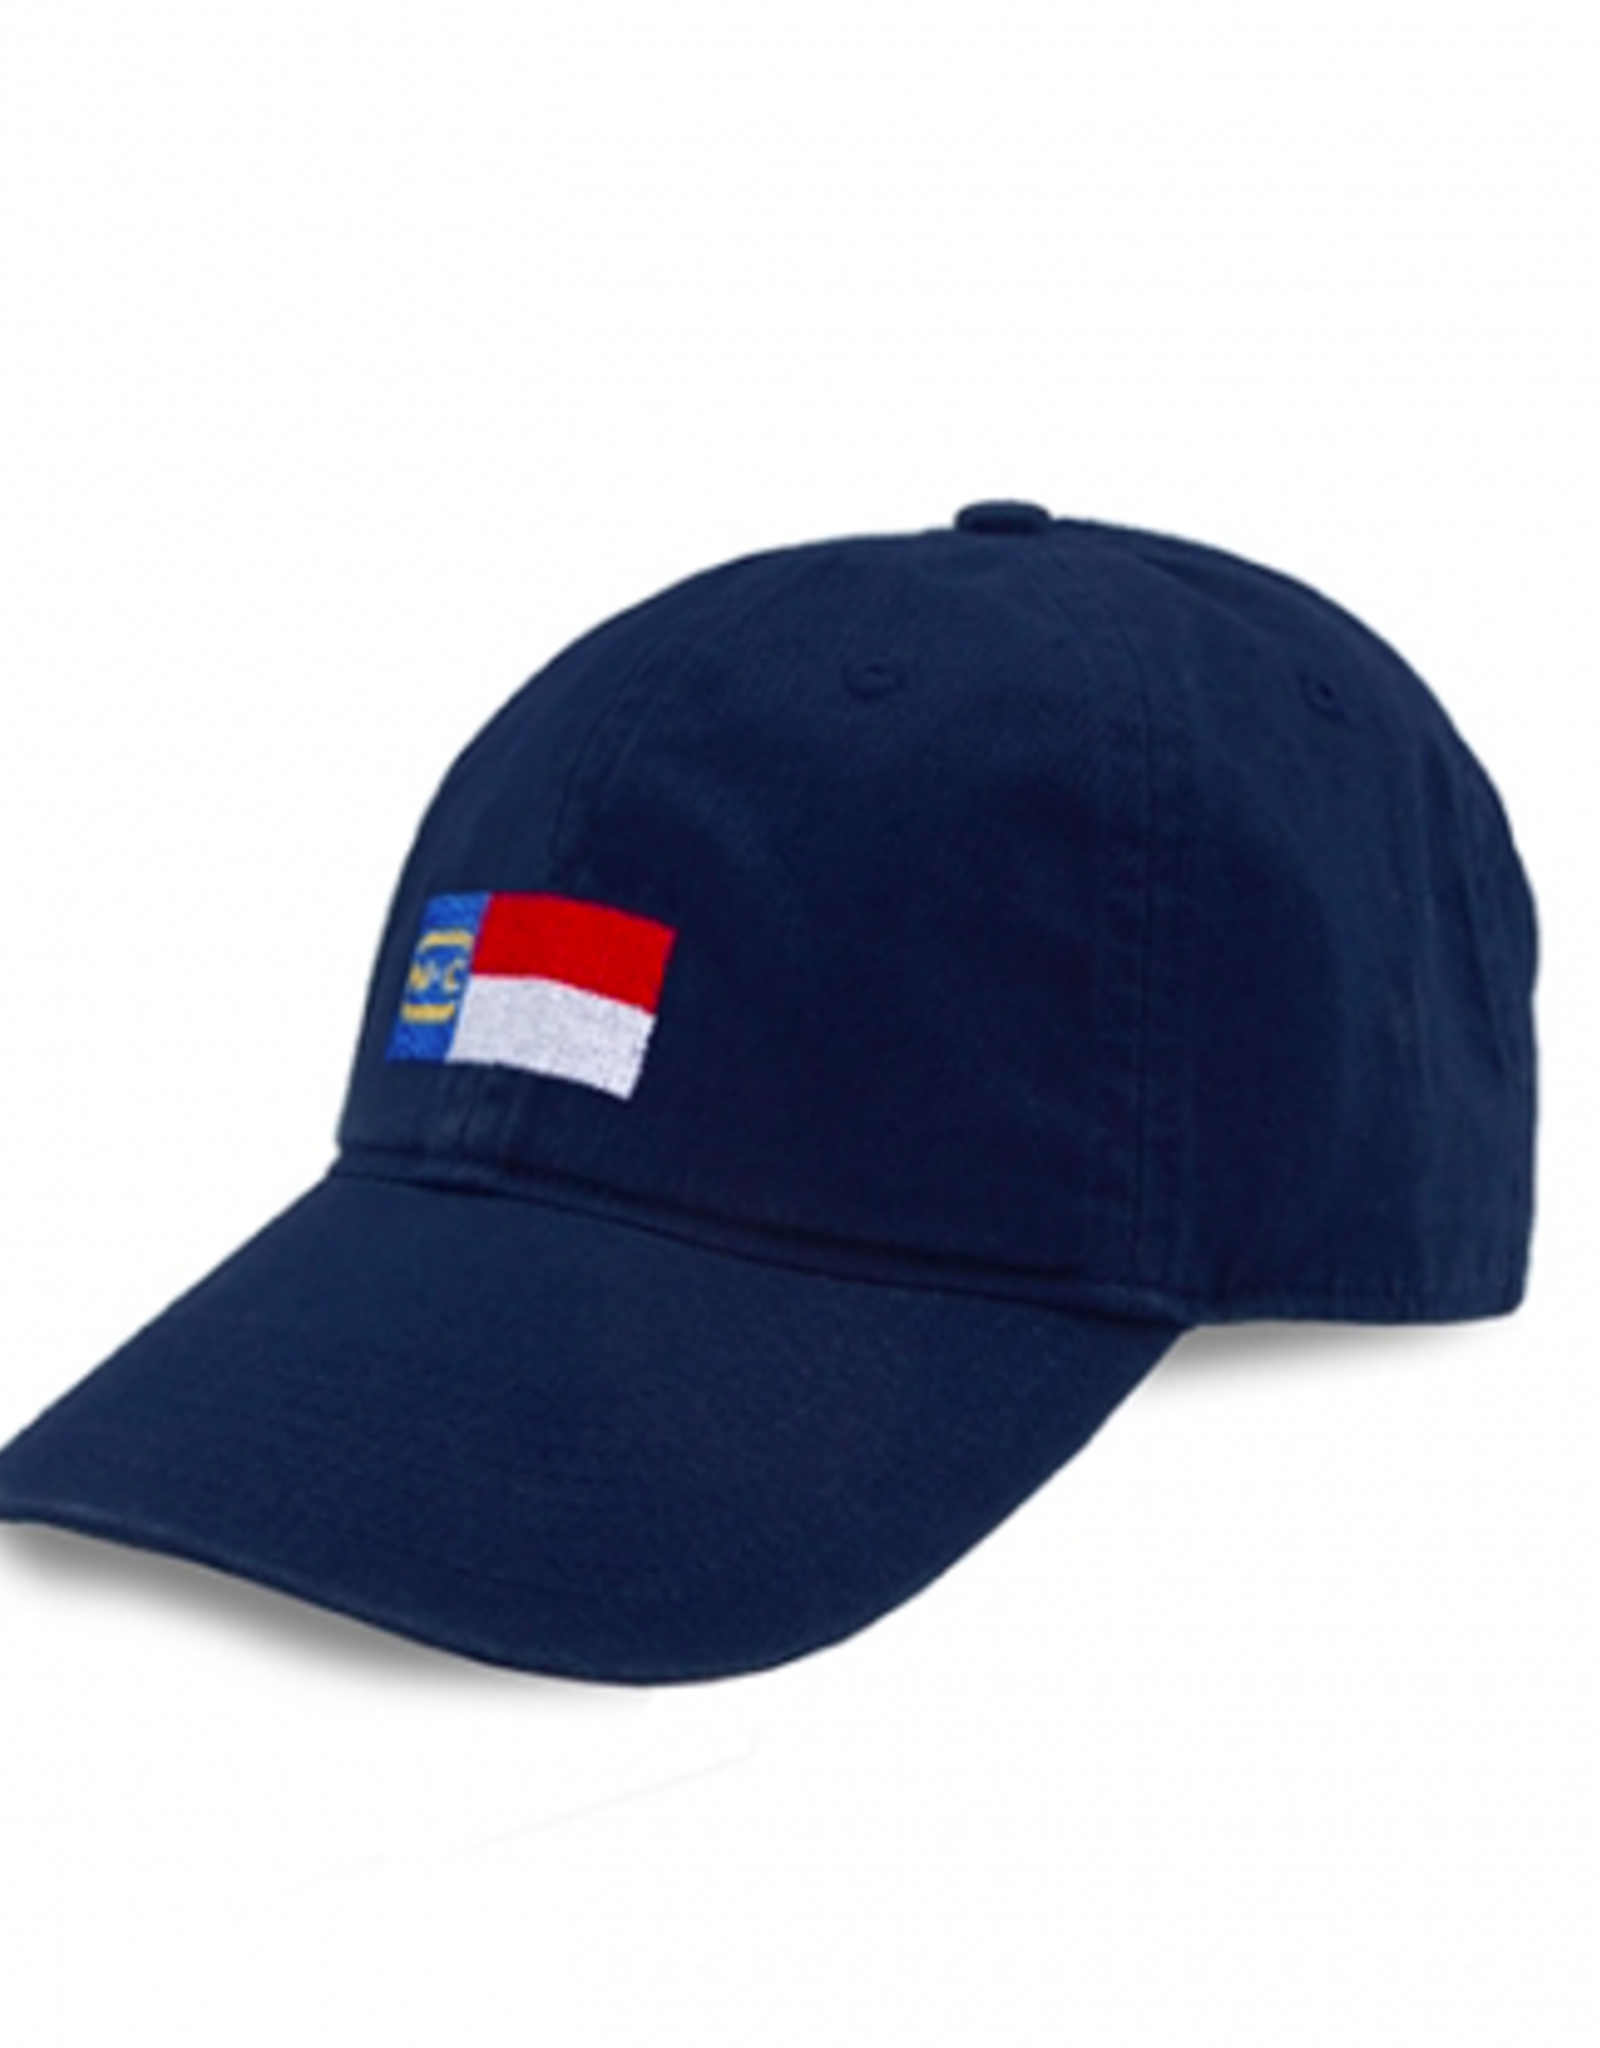 Smathers and Branson North Carolina State Flag Hat